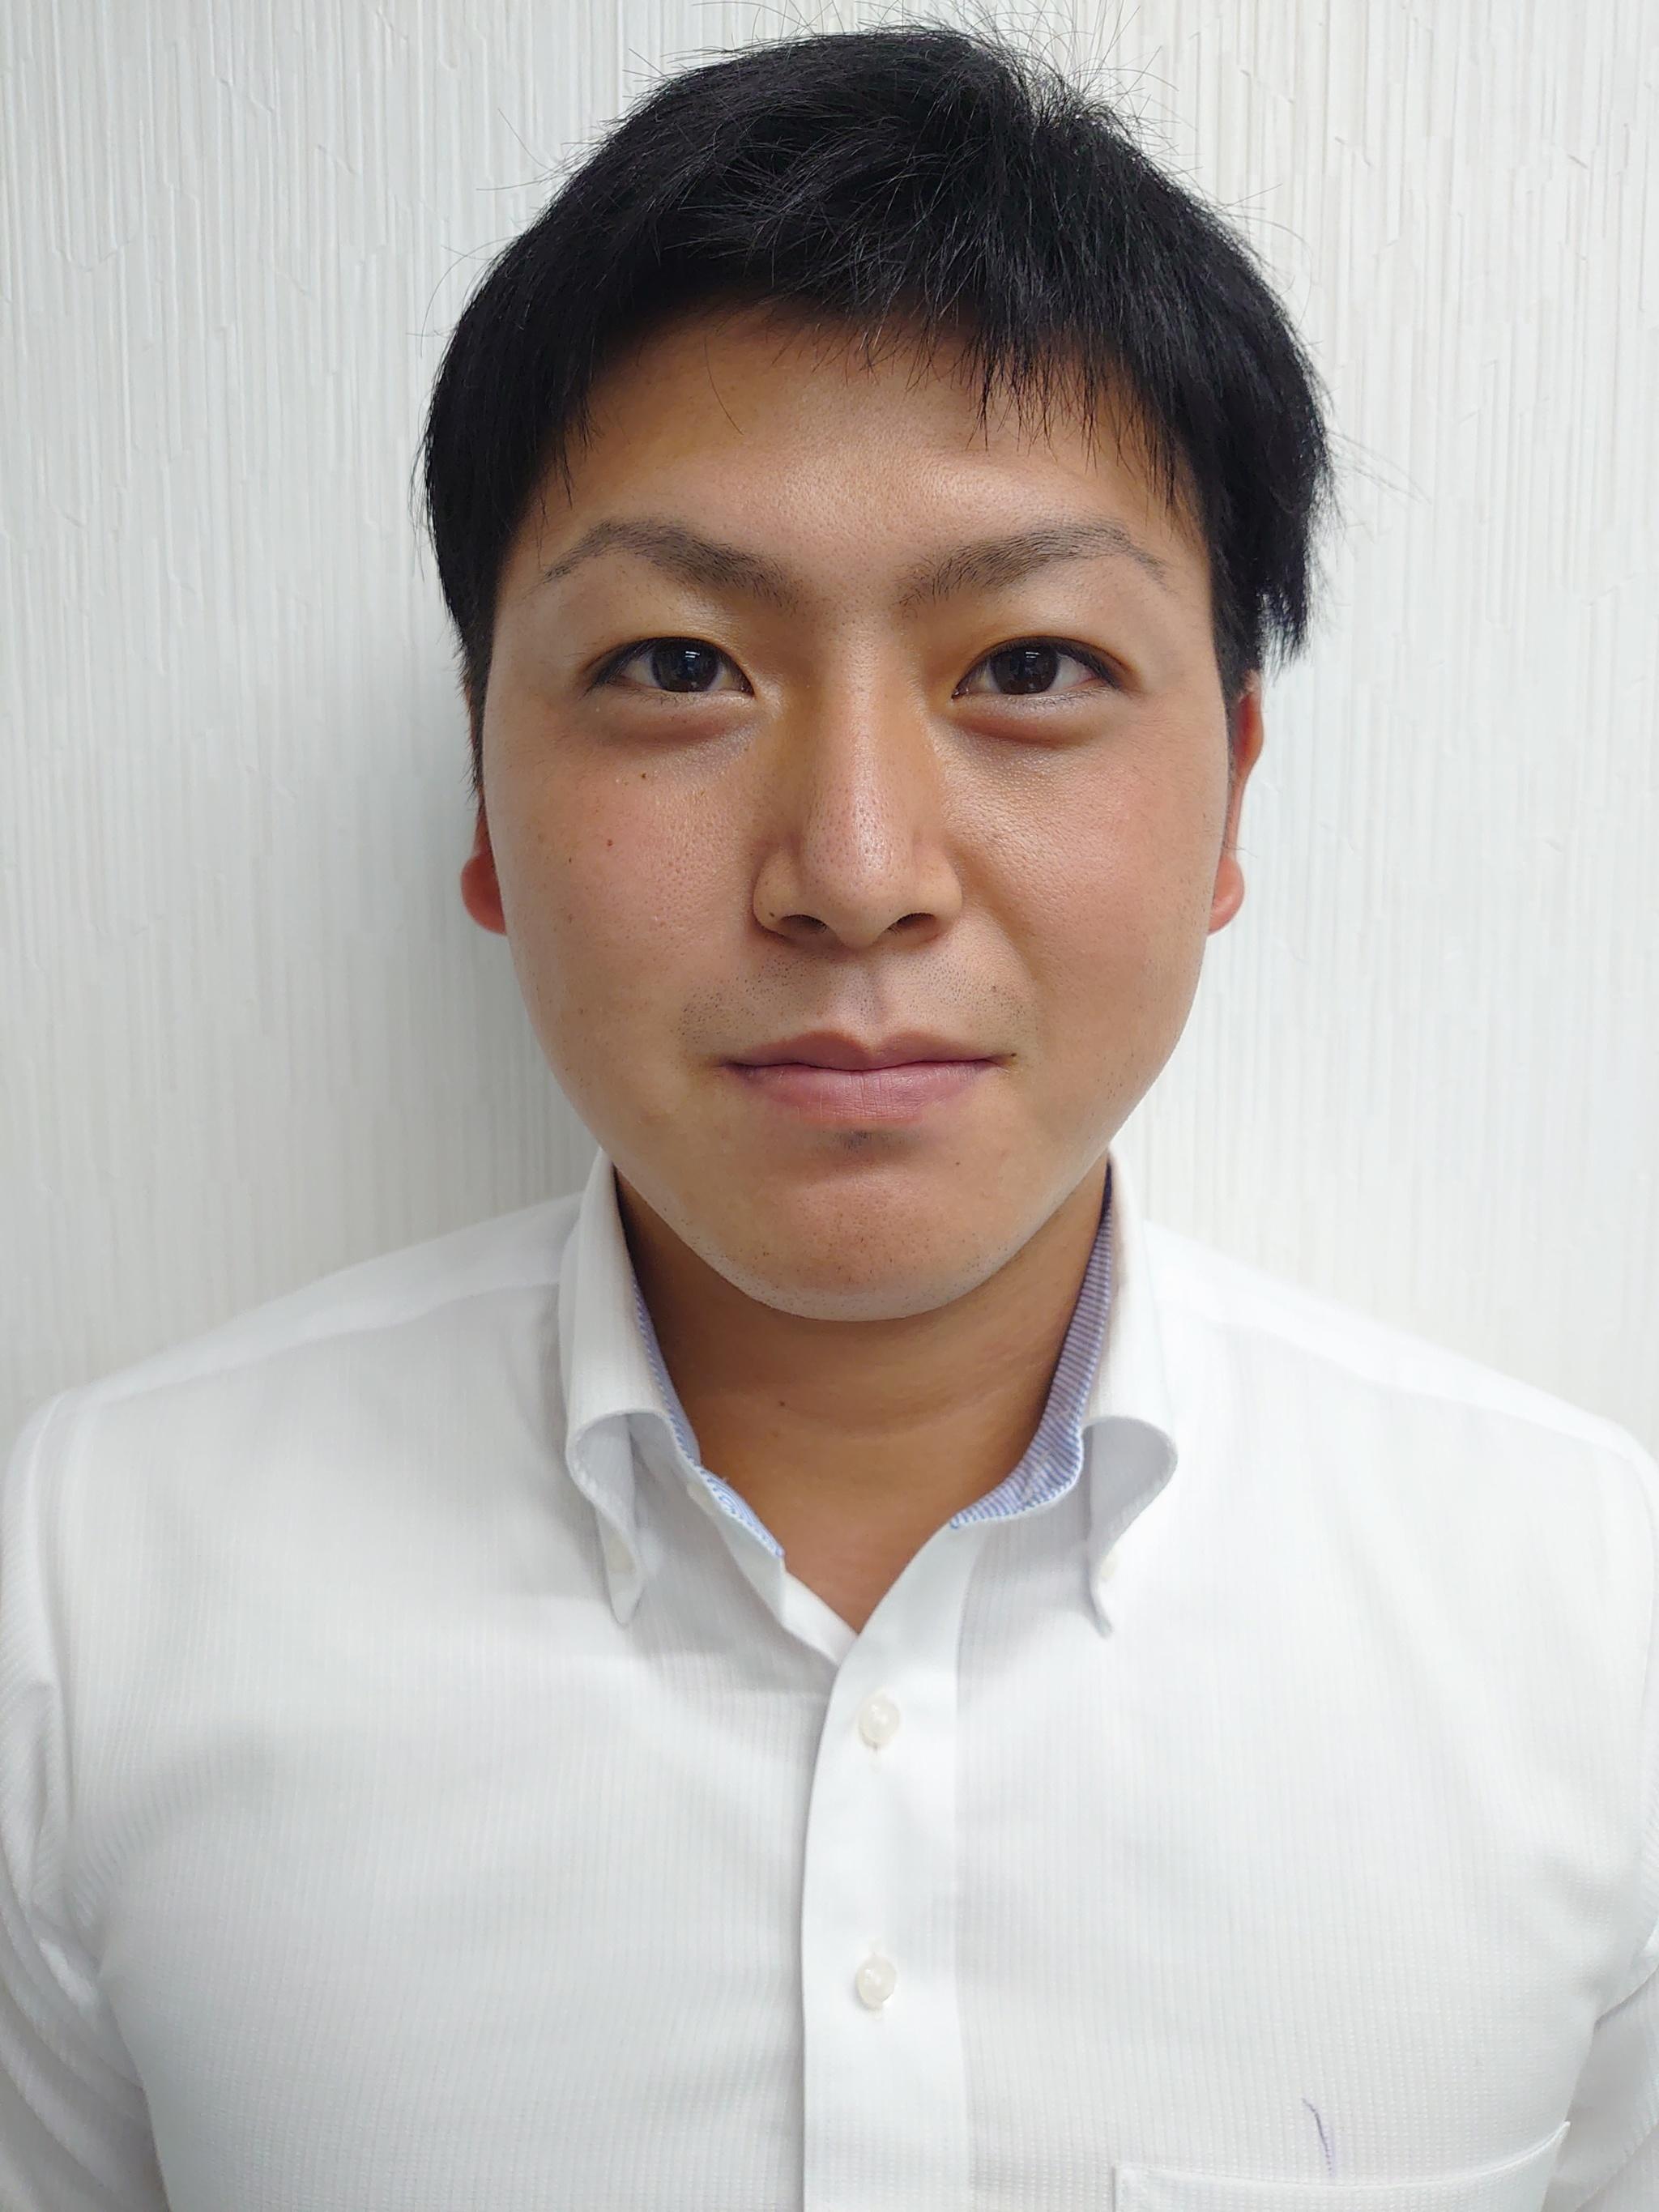 http://suzuya-k.jp/files/libs/1478/202010151017522629.JPG